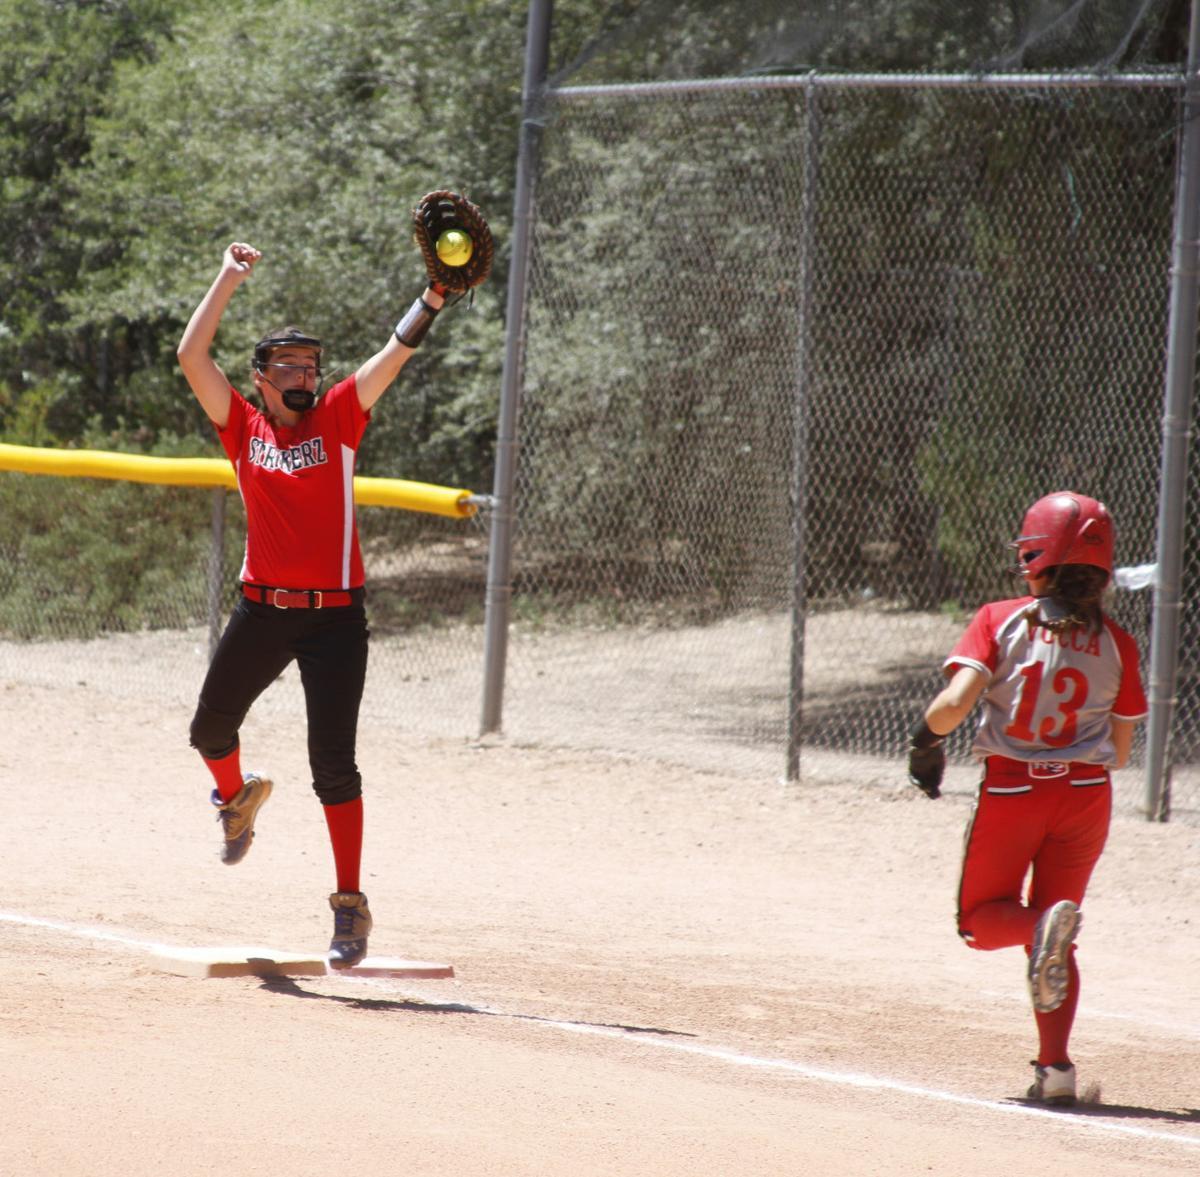 Softball Play At First